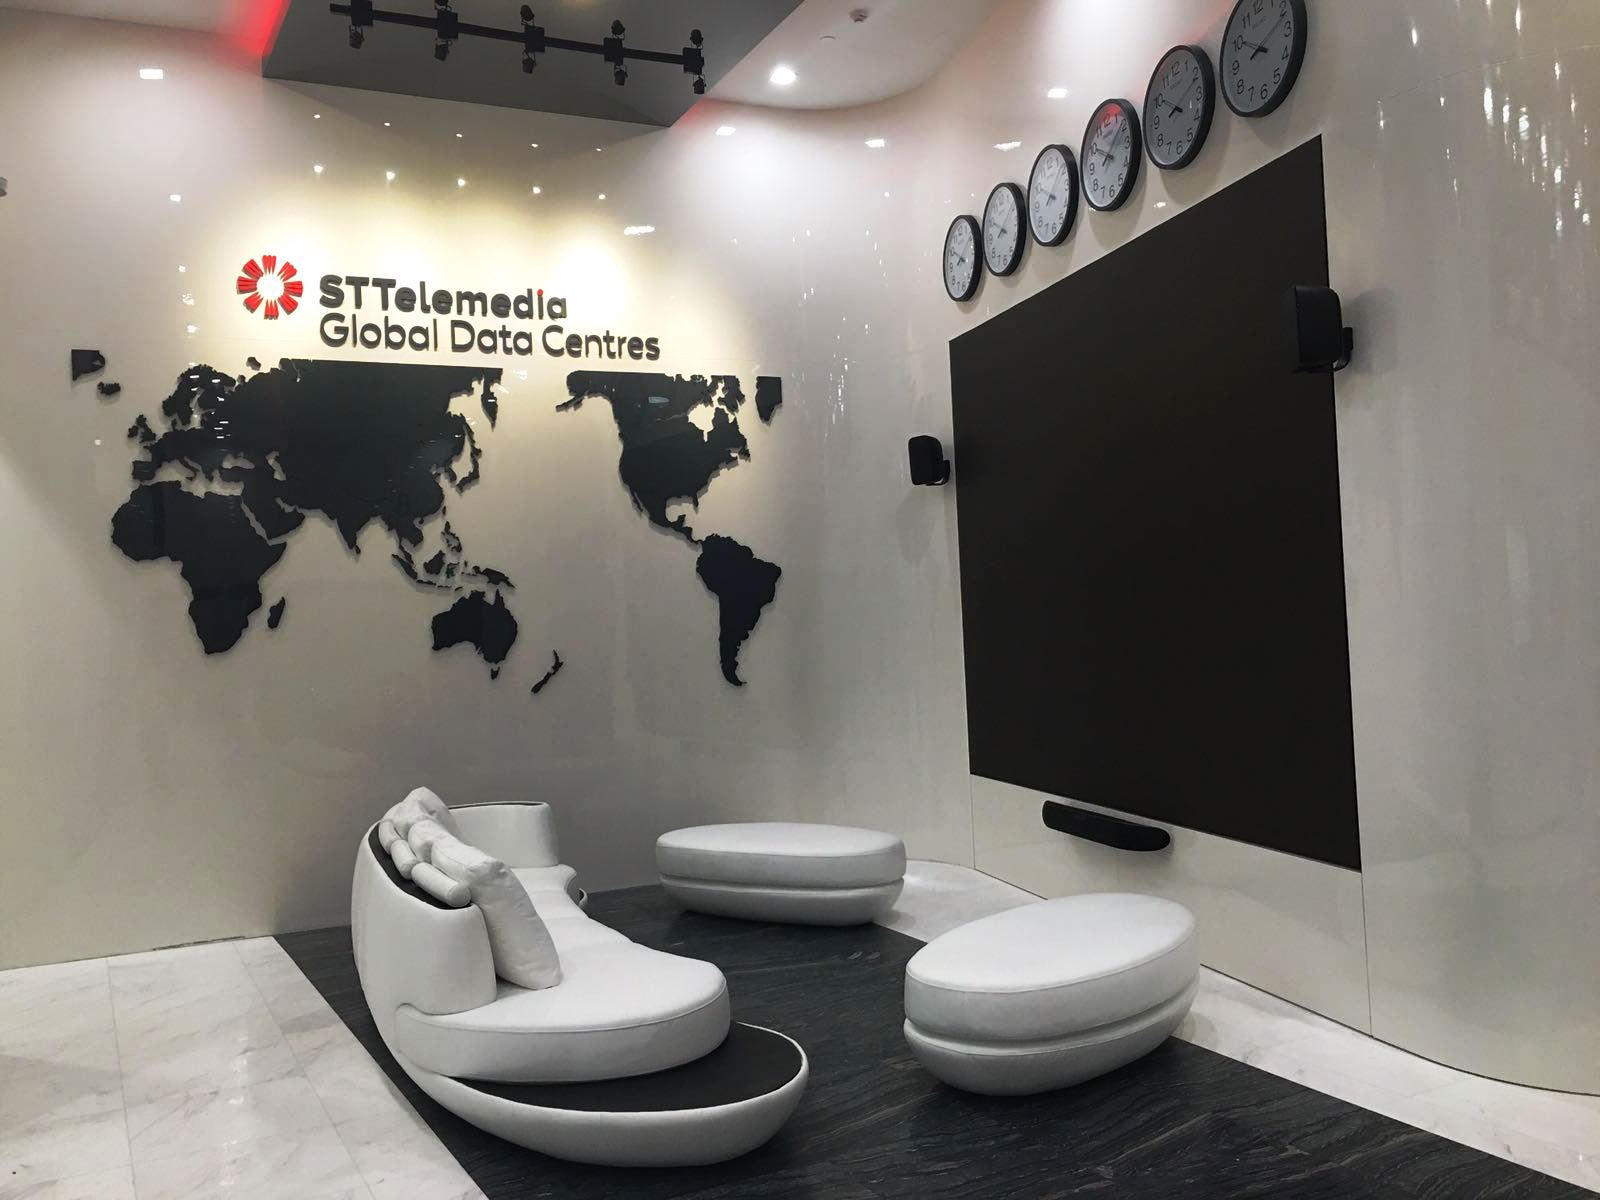 ST Telememdia_Reception Sign